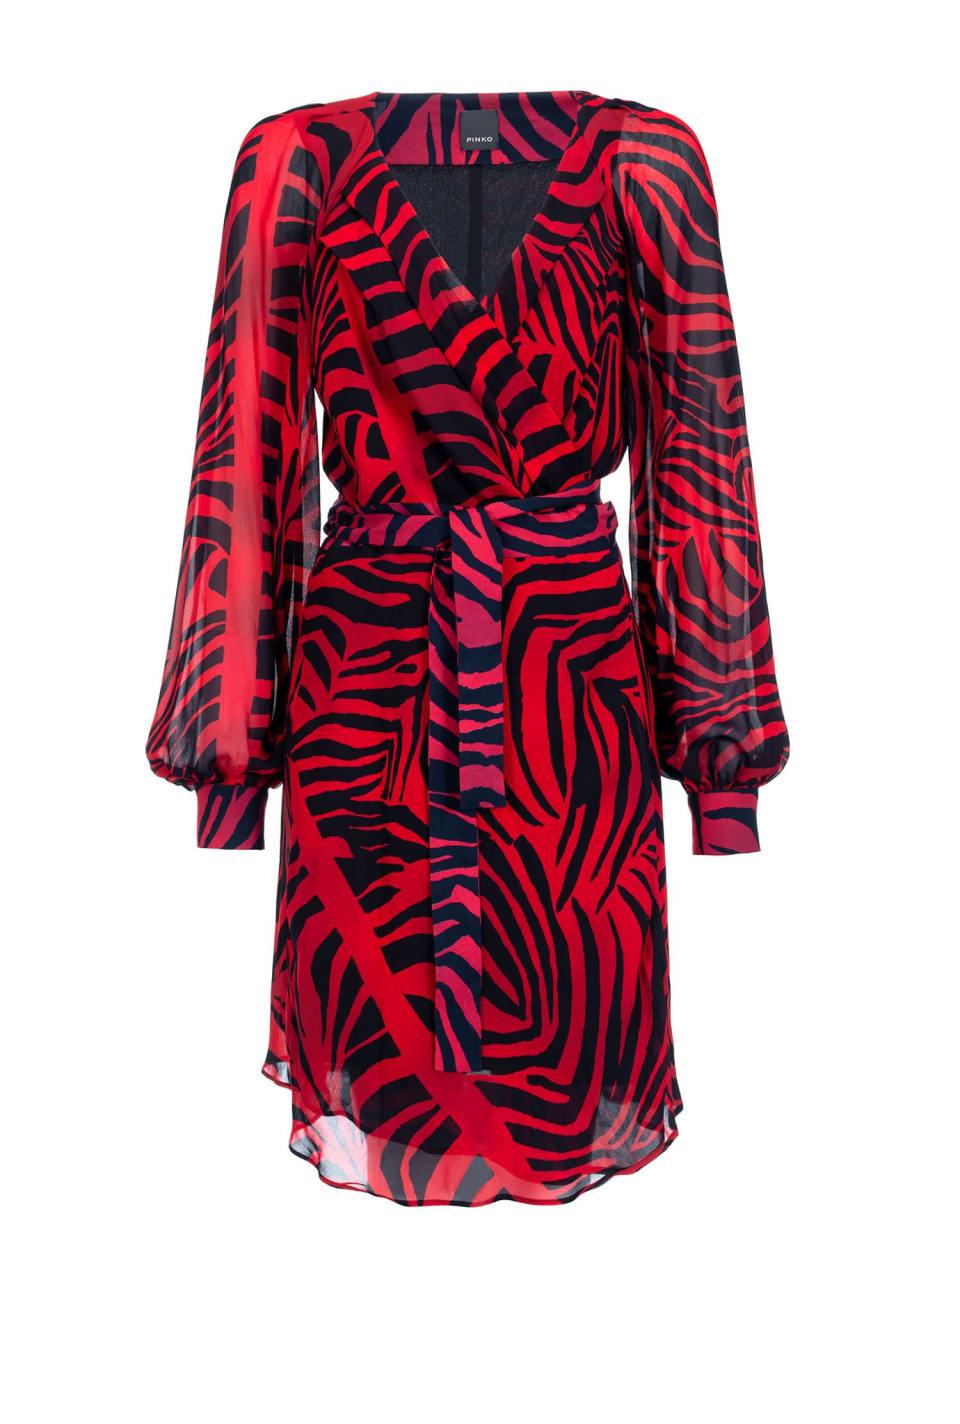 Red zebra print dress